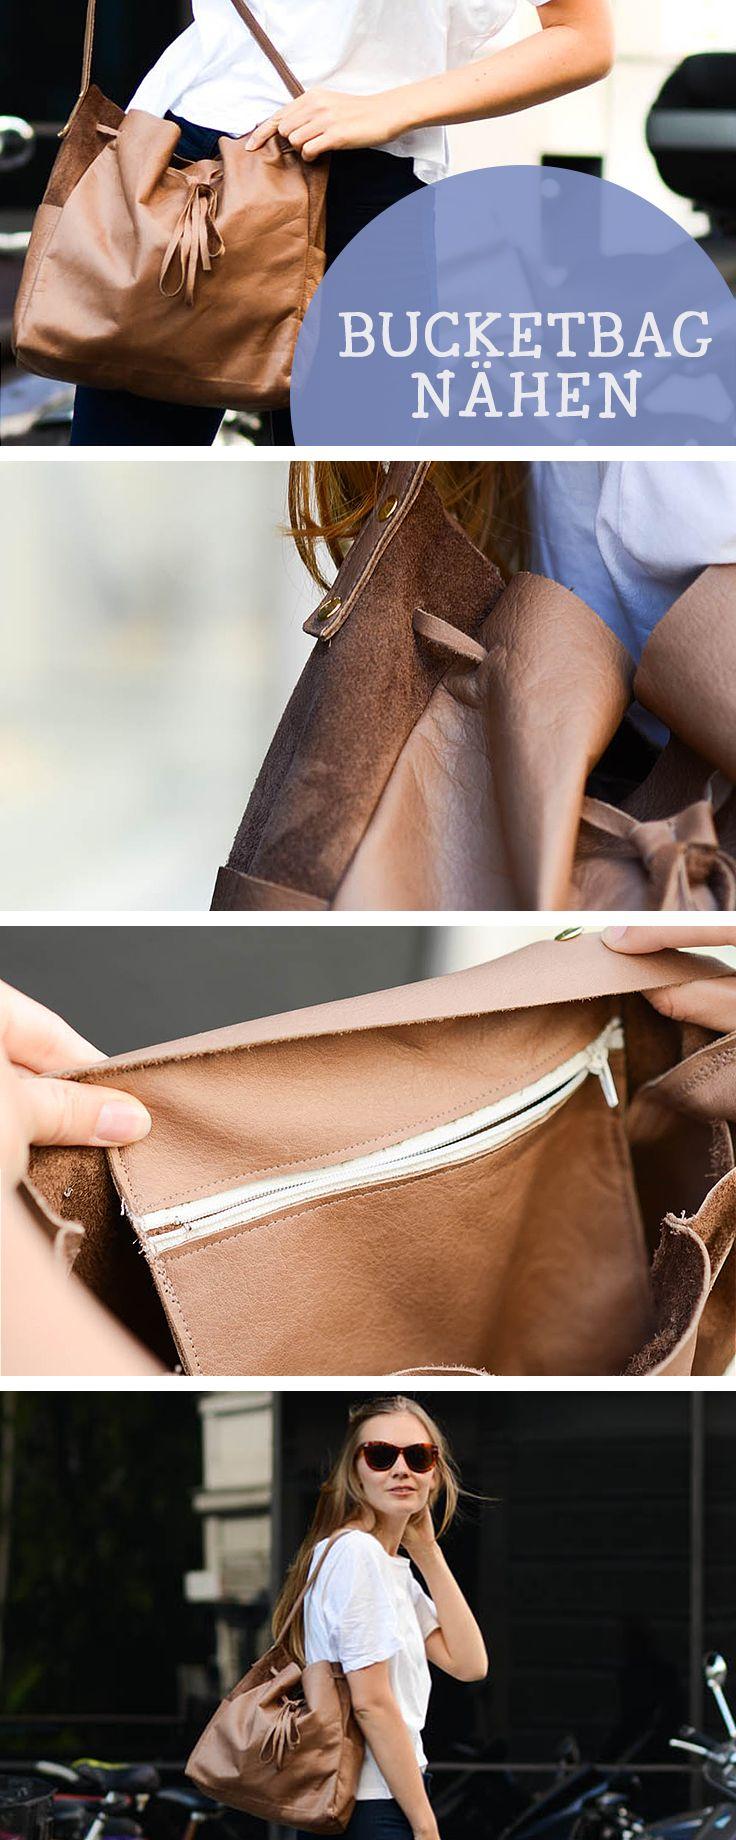 DIY-Nähanleitung: Große BucketBag nähen, Schultertasche, Mode nähen / diy sewing tutorial: sew your own bucket bag, fashion DIY ideas via DaWanda.com